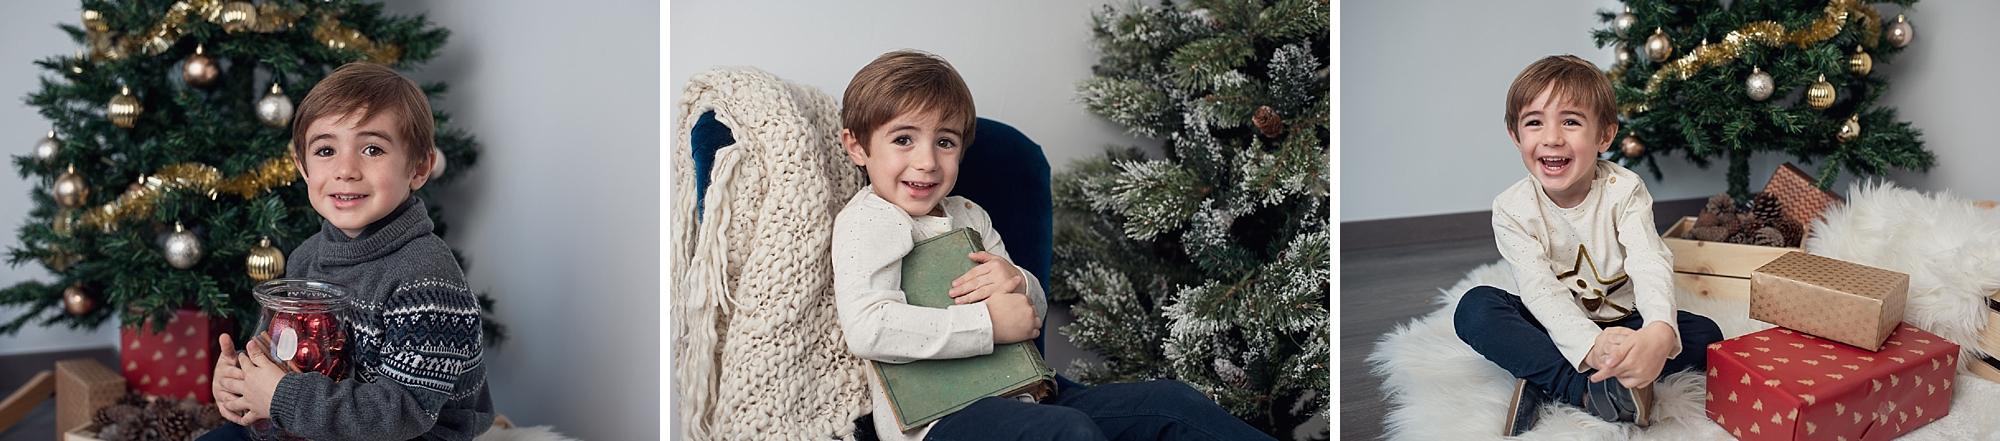 Mandarina - fotos de navidad familiares